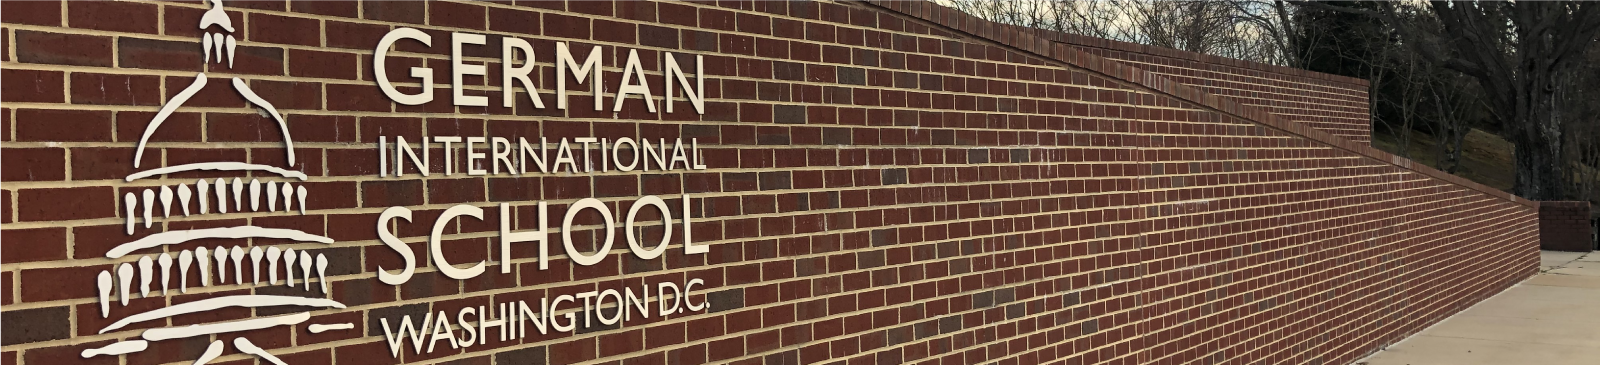 German International Schools of Washington DC